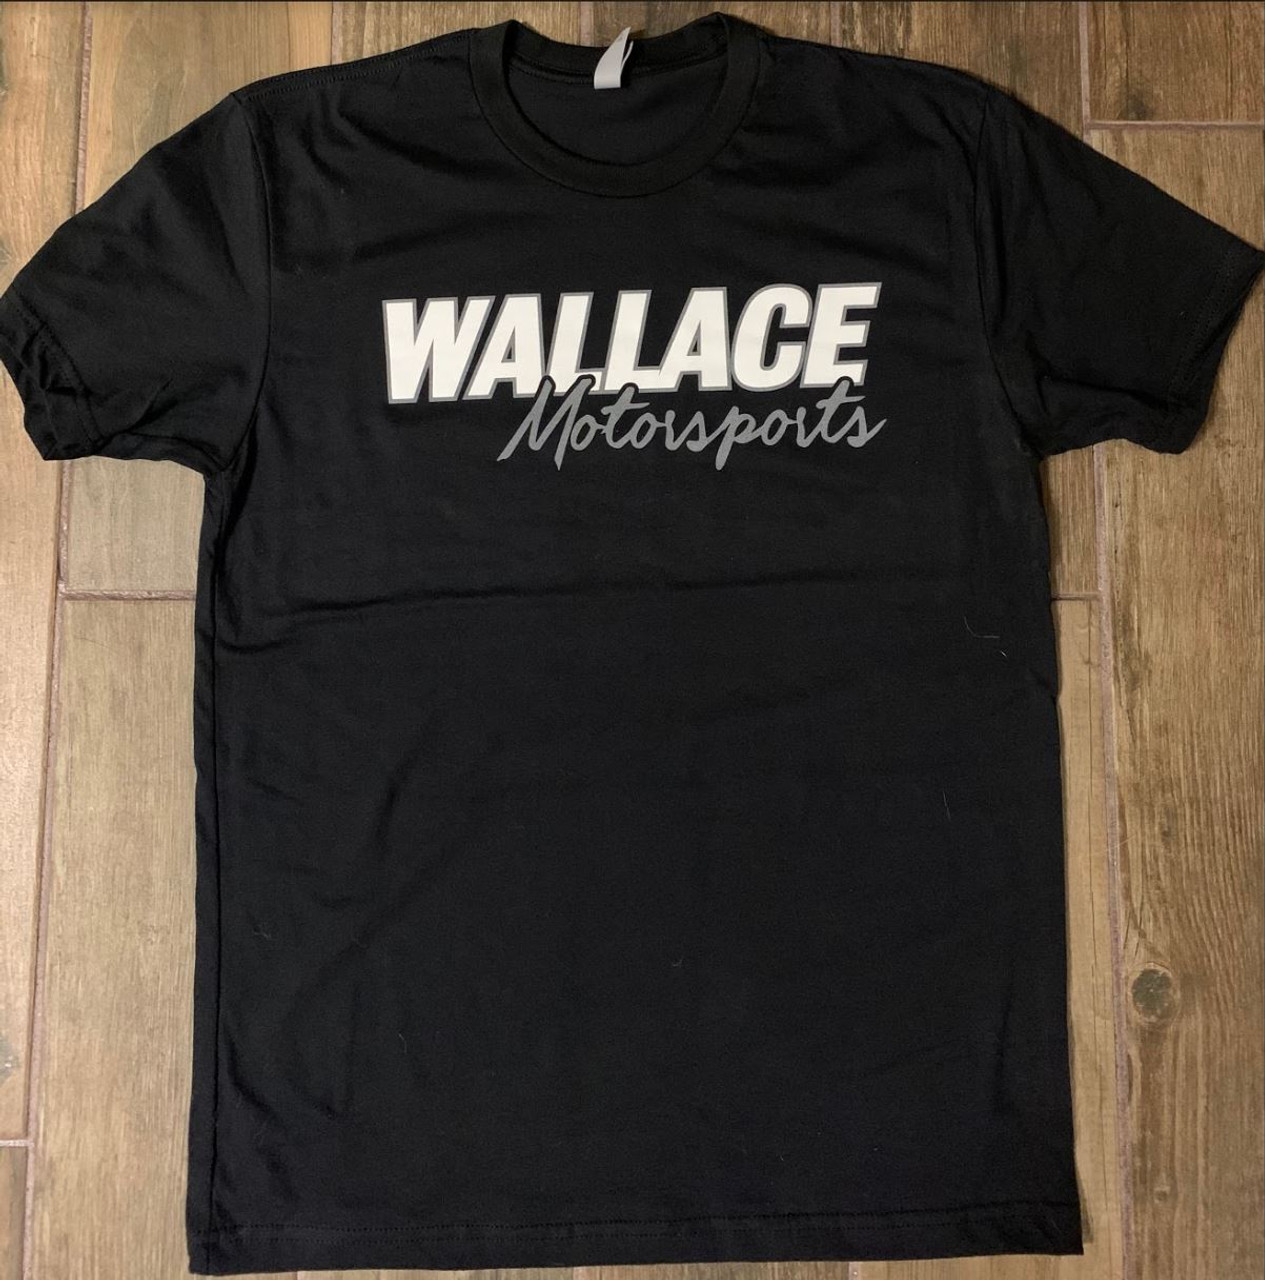 Wallace Motorsport T-Shirt (Black)